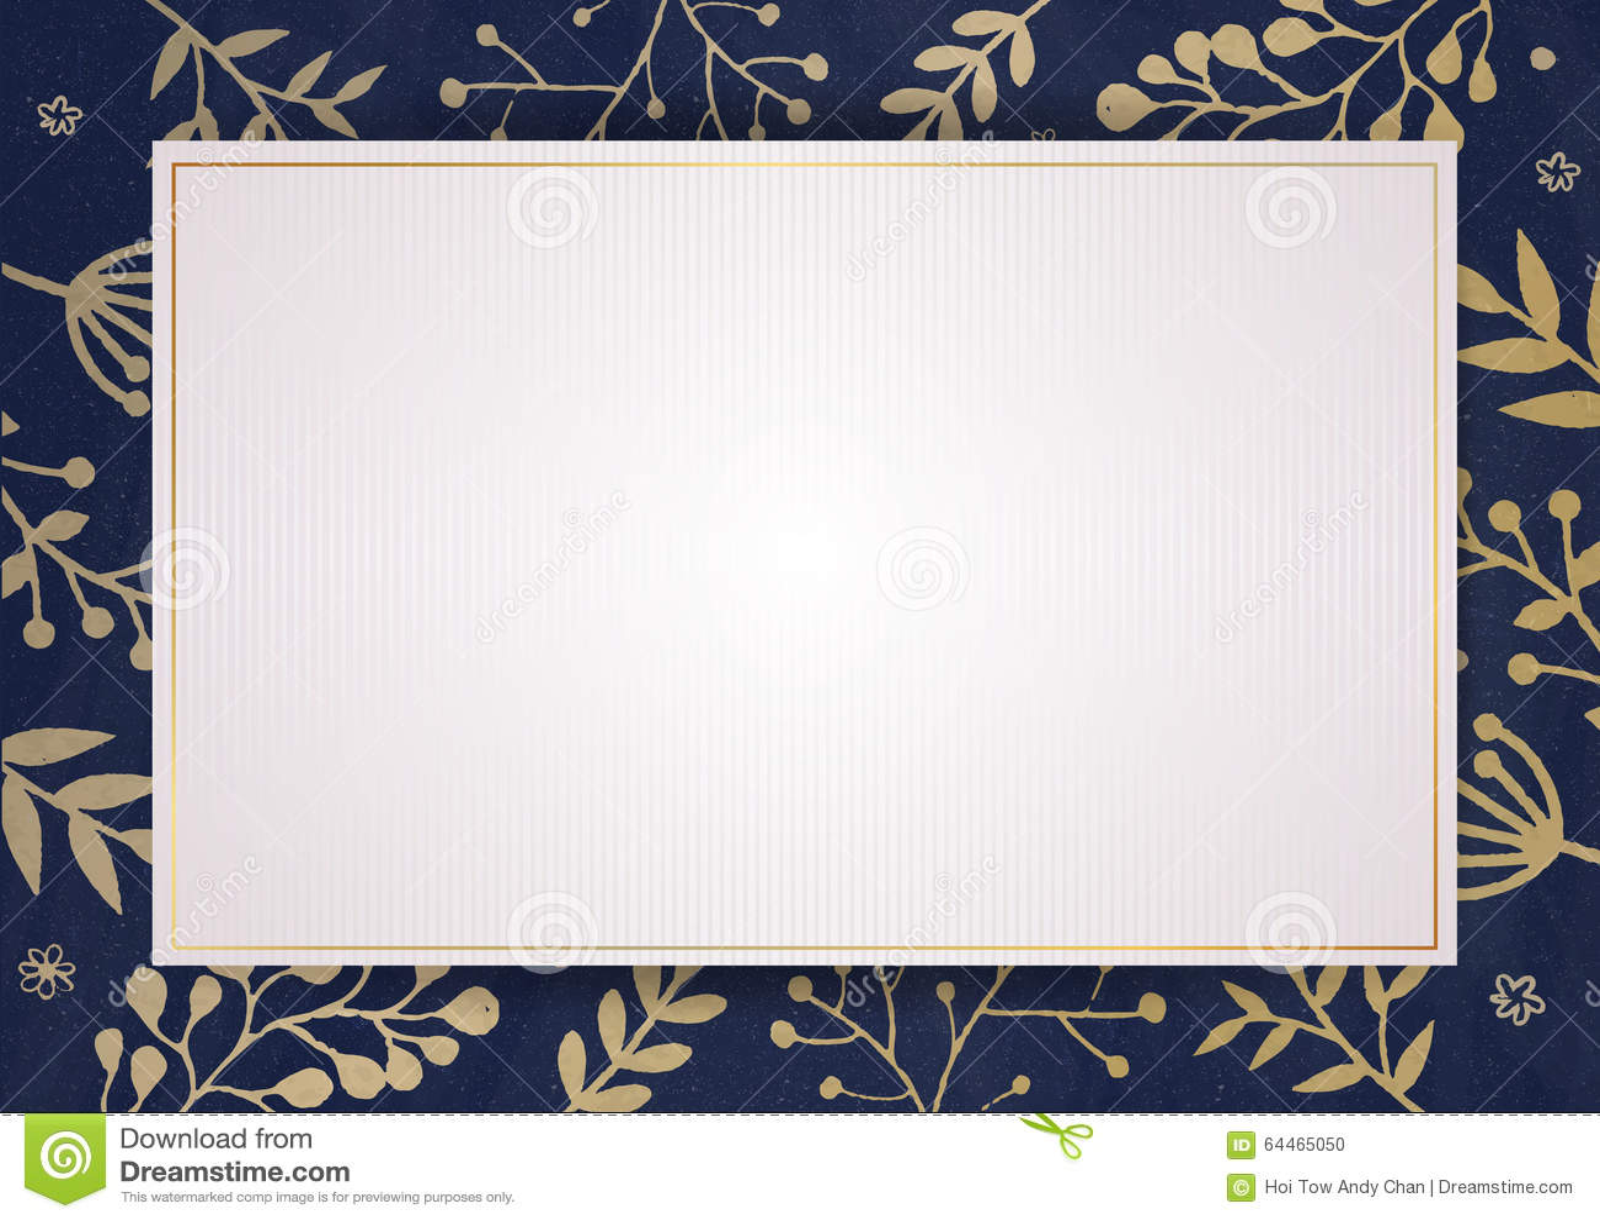 elegant invitation card with florals border stock photo